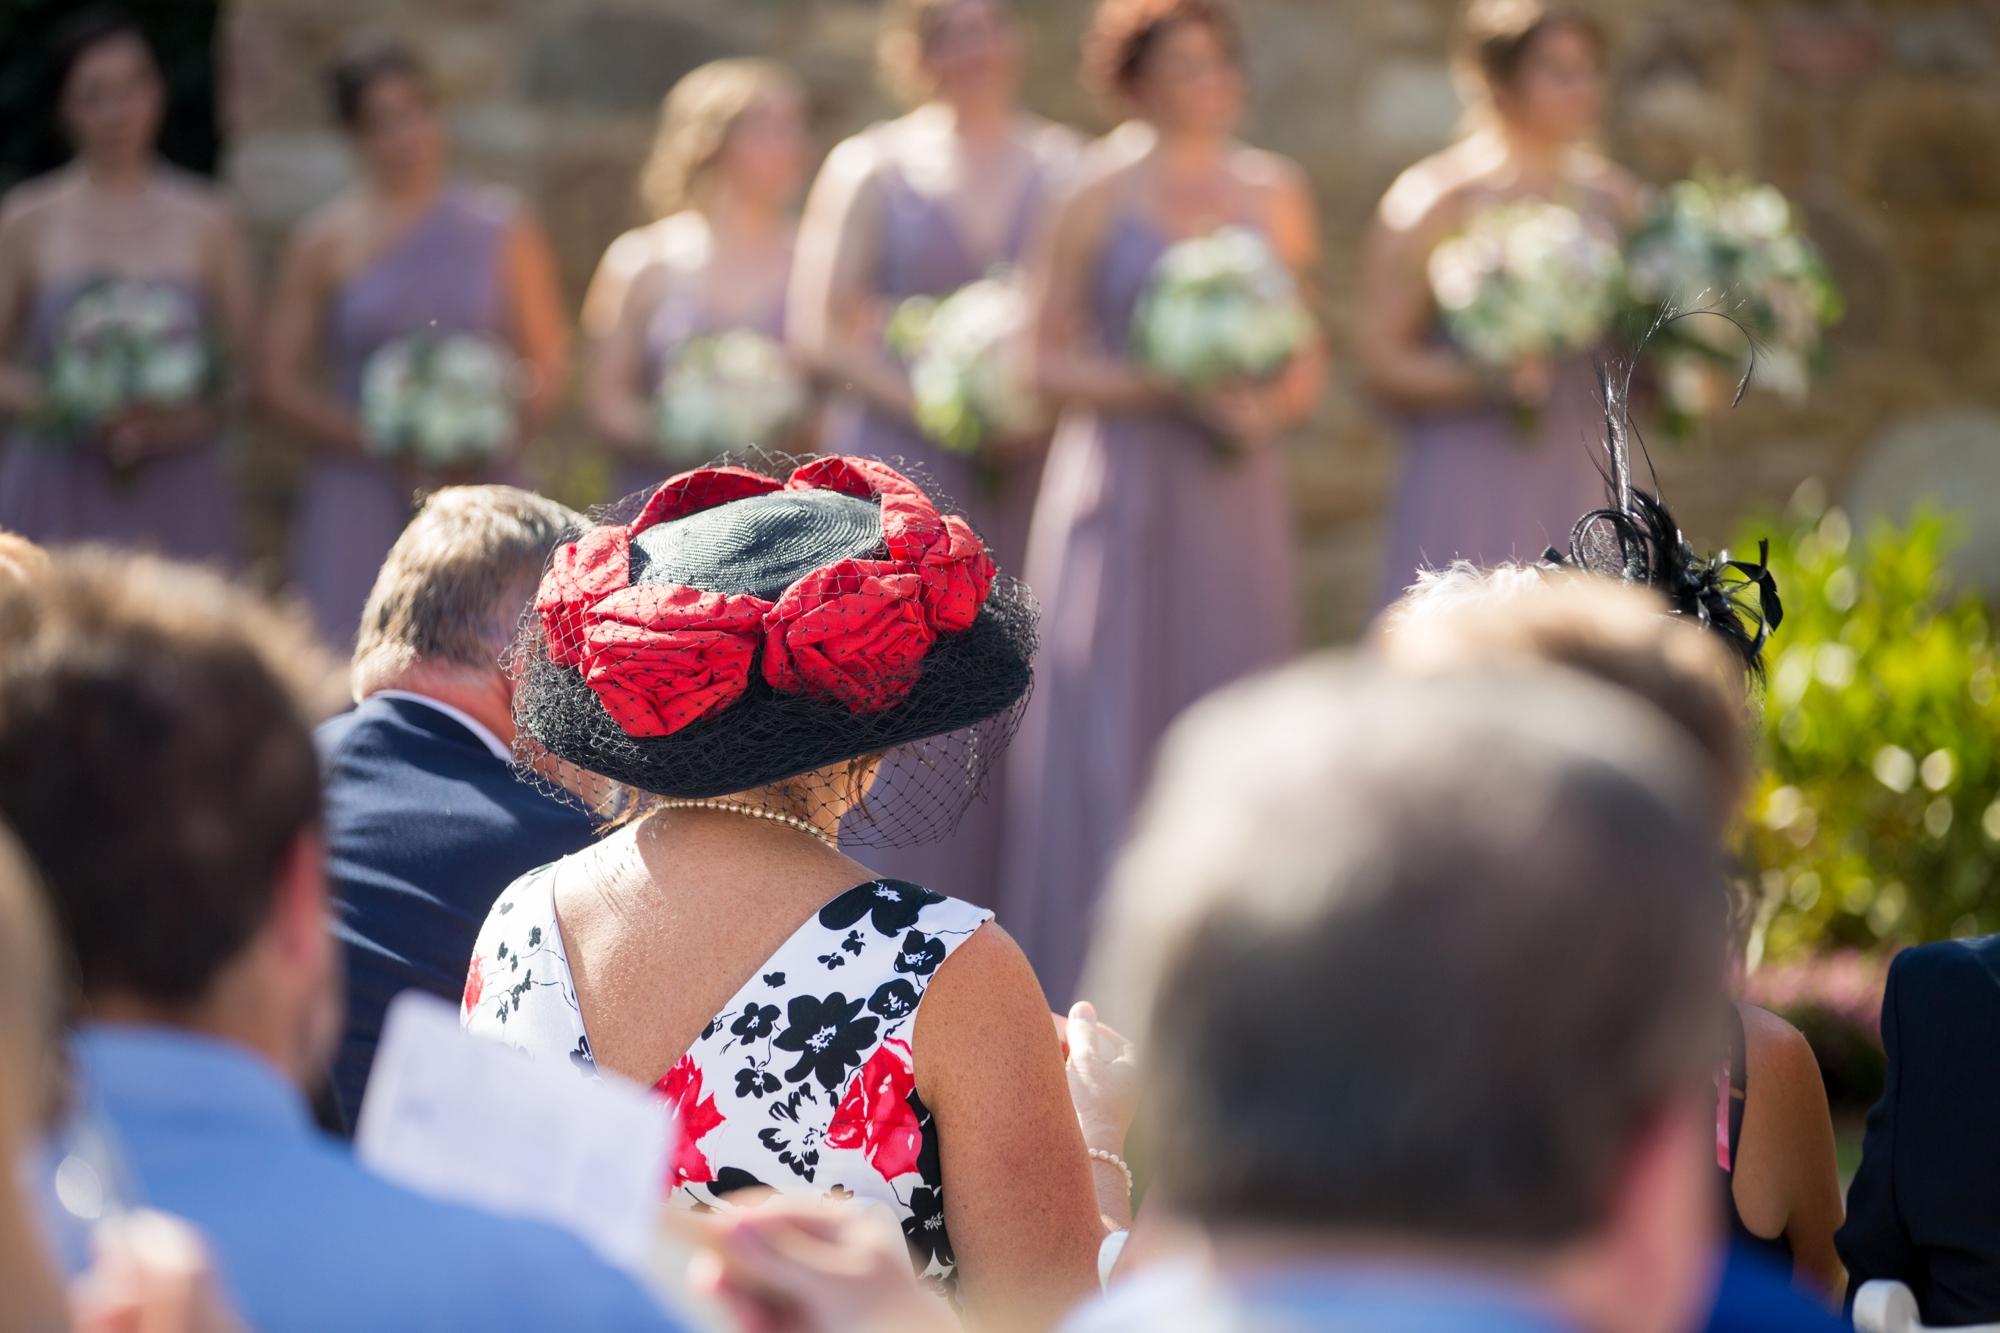 pittsburgh botanic garden wedding photos, pittsburgh wedding venues, best locations for photoshoot in pittsburgh, the best pittsburgh wedding photographers, pittsburgh botanic garden